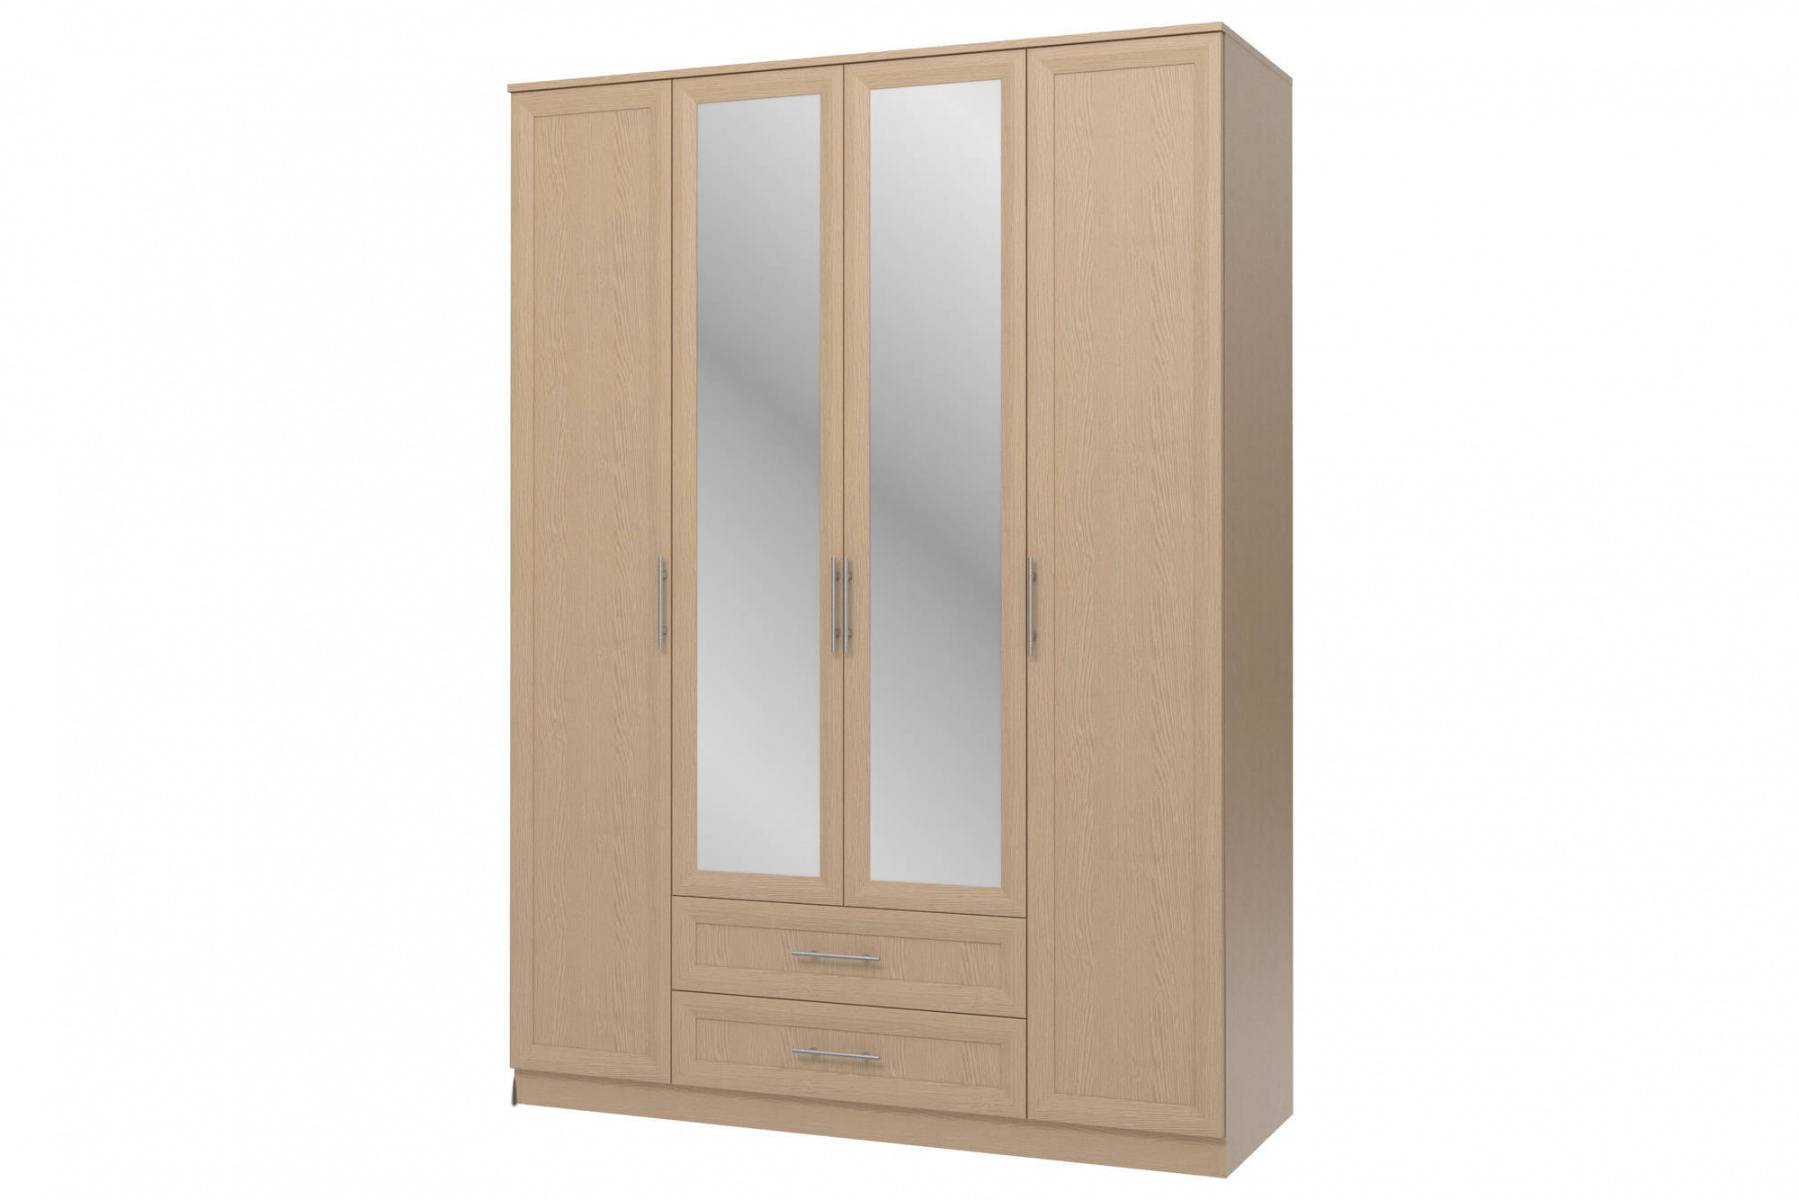 Шкаф 4-х дверный с зеркалами Юлианна СБ.Н-074-01